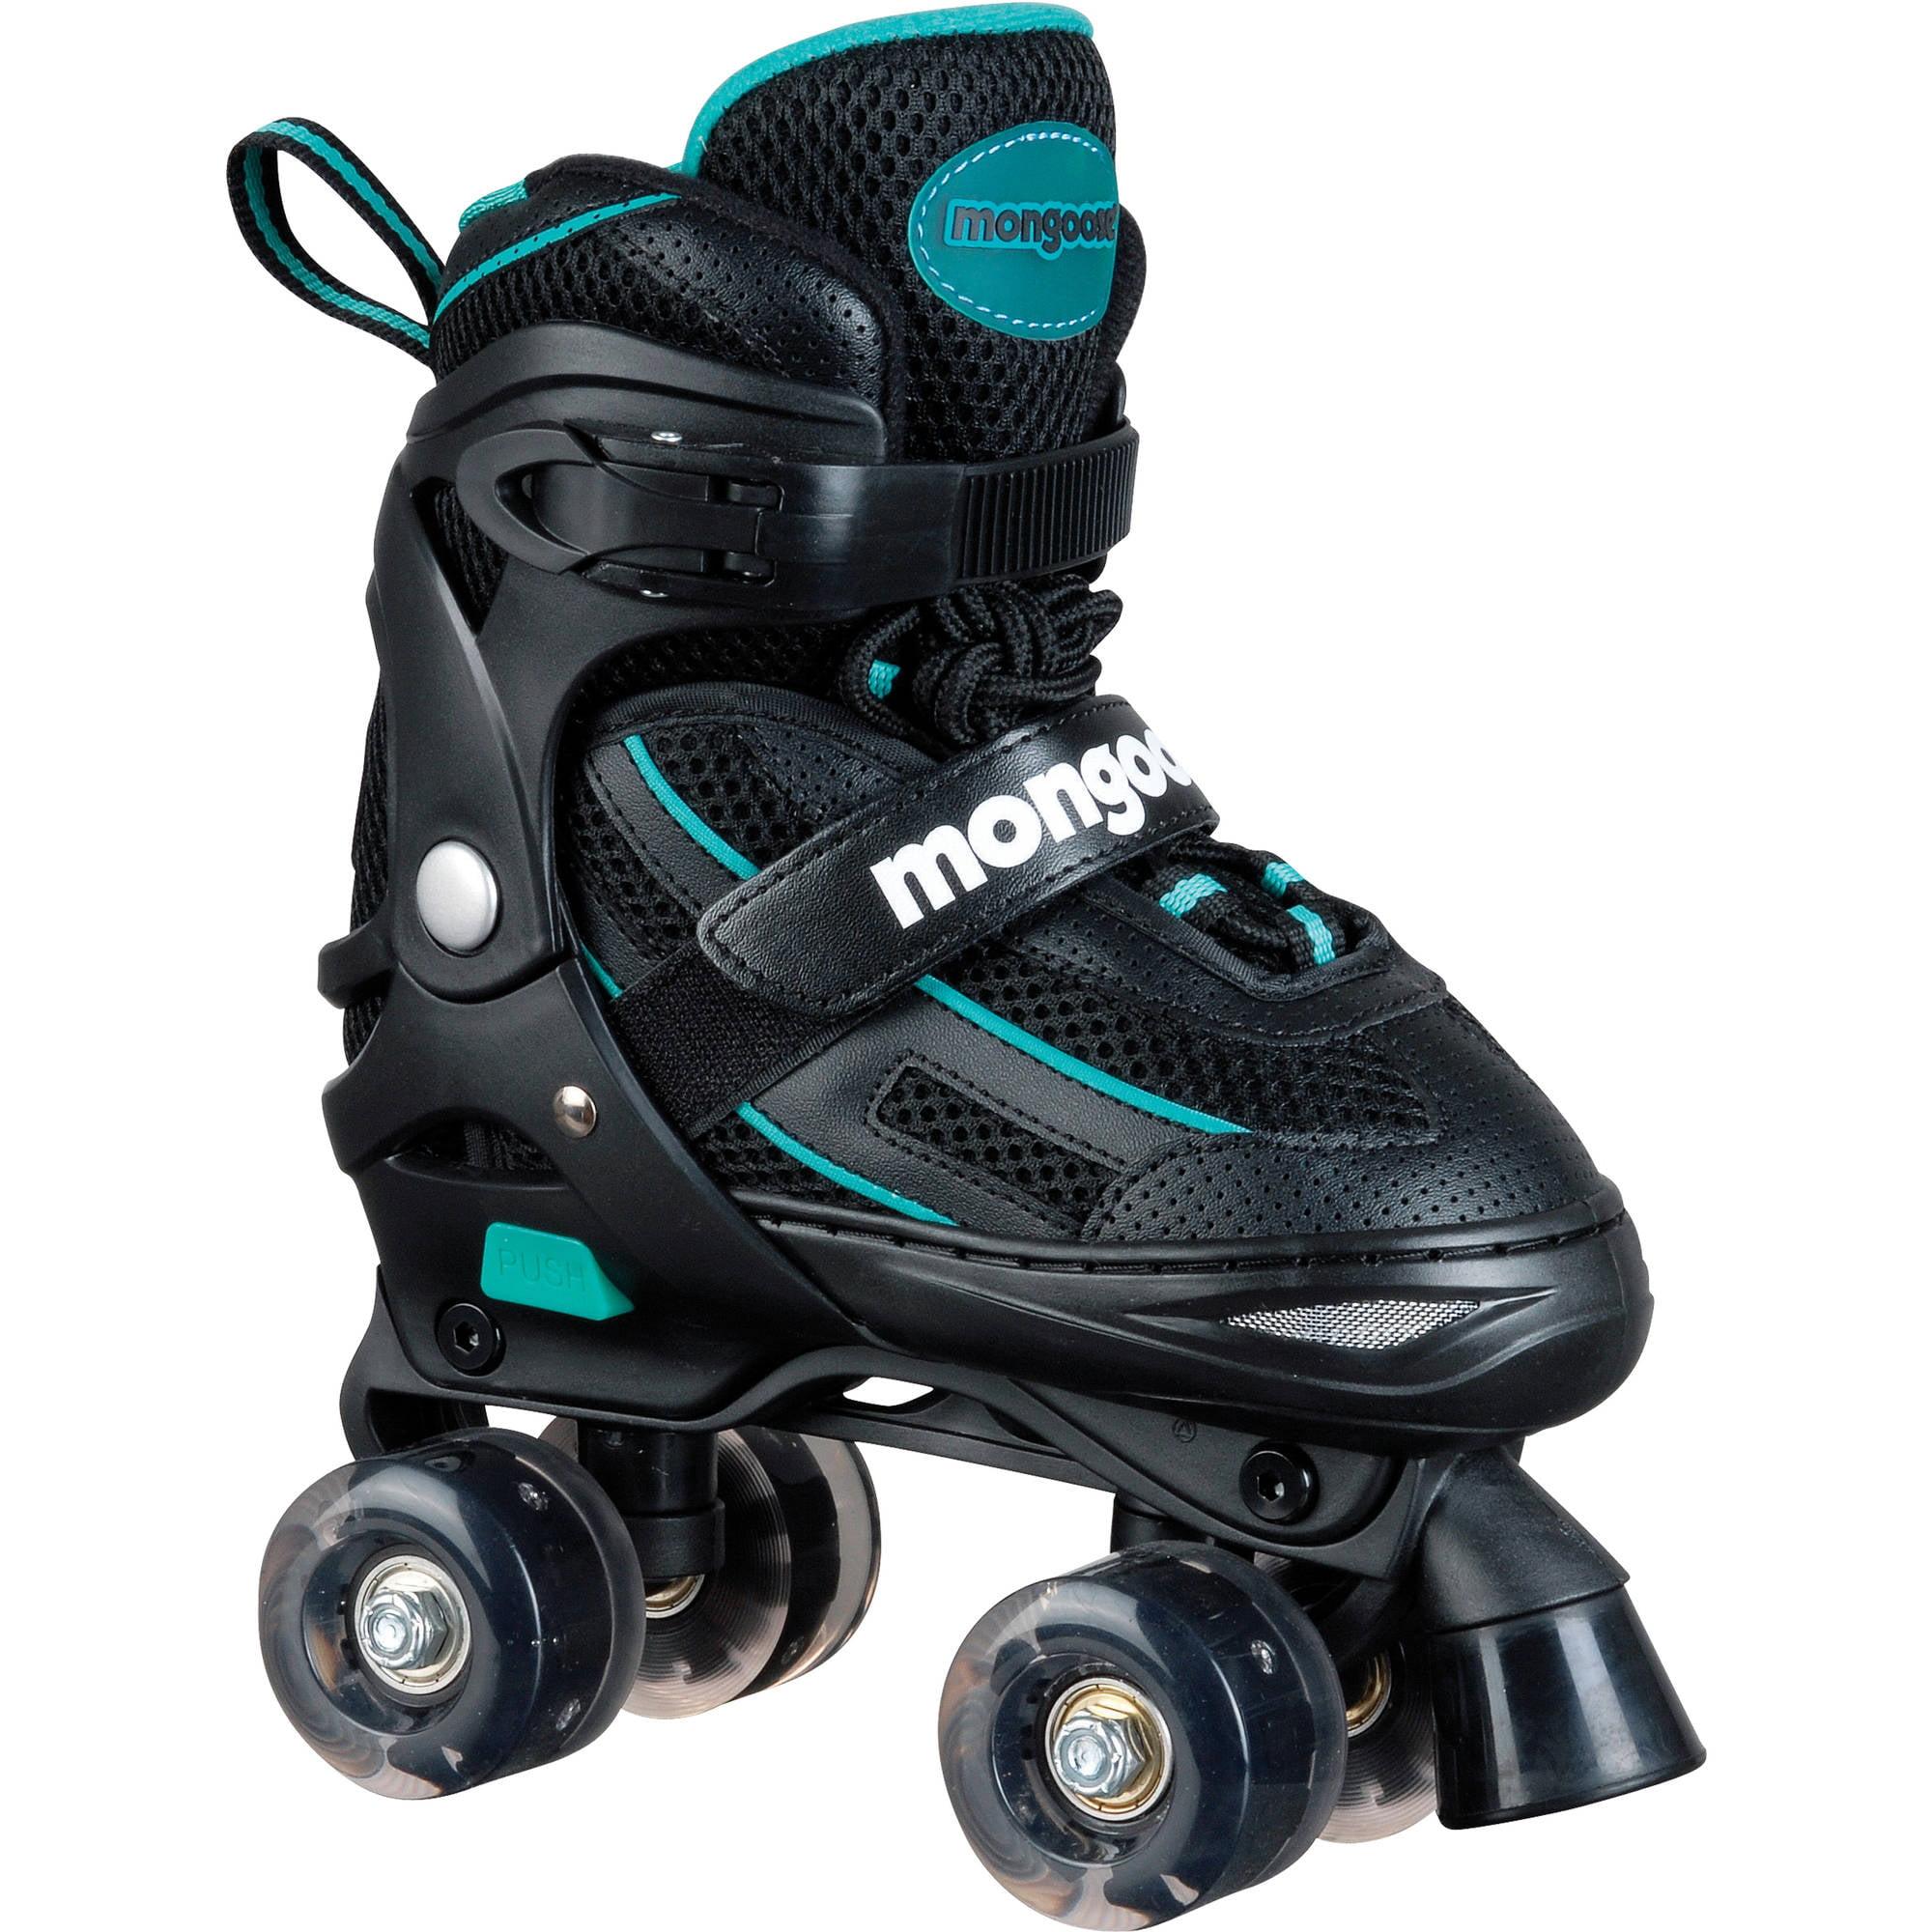 Roller skates light up - Roller Skates Light Up 23